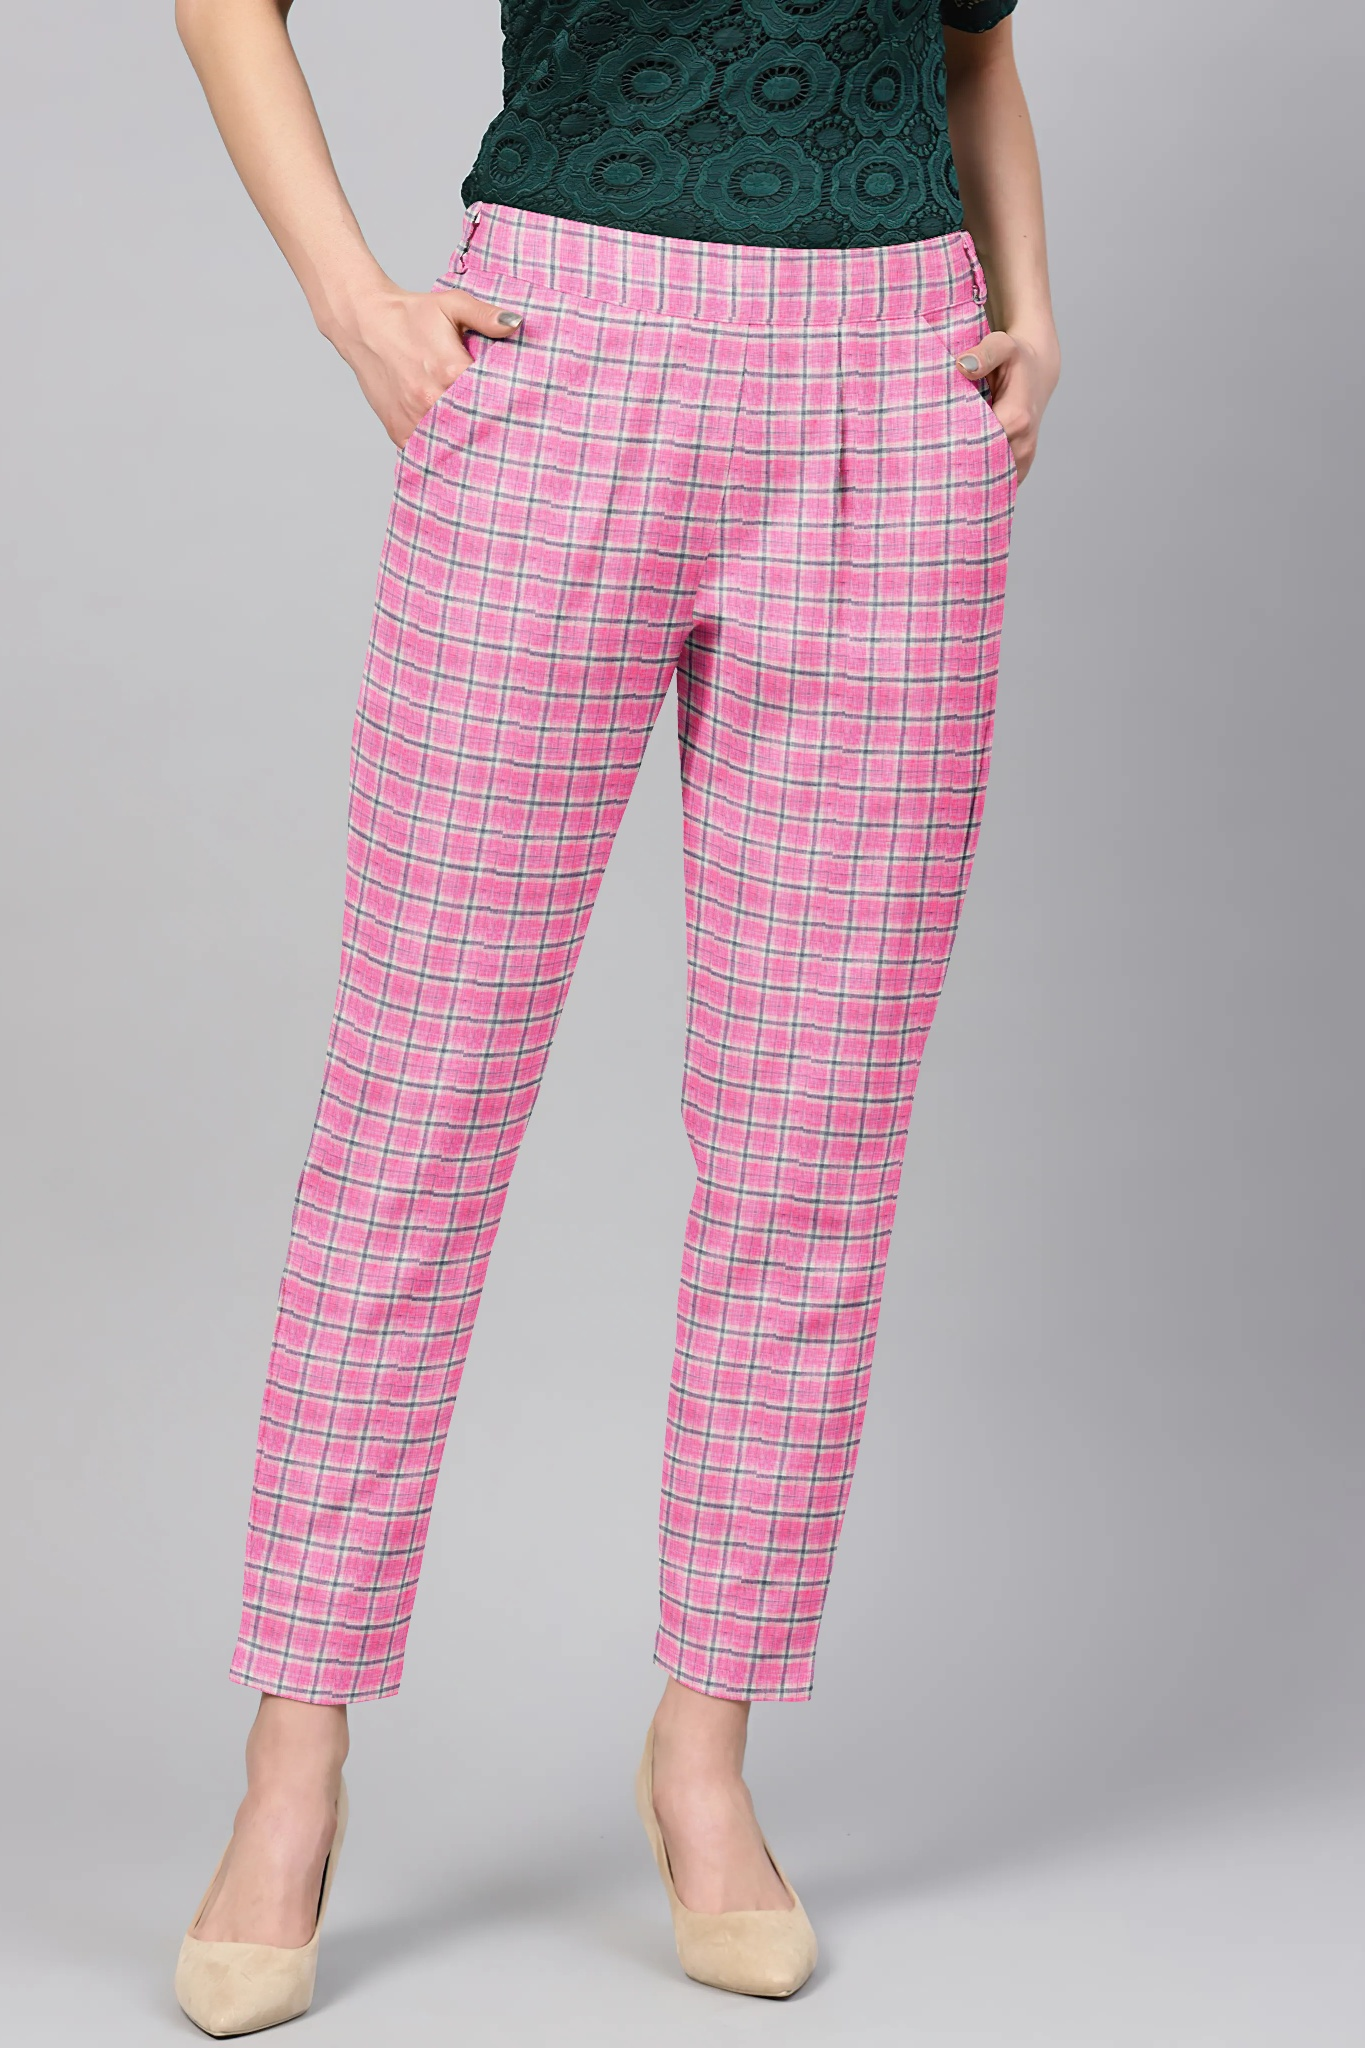 /home/customer/www/fabartcraft.com/public_html/uploadshttps://www.shopolics.com/uploads/images/medium/Pink-Blue-Cotton-Check-Regular-Fit-Solid-Trouser-36056.jpg